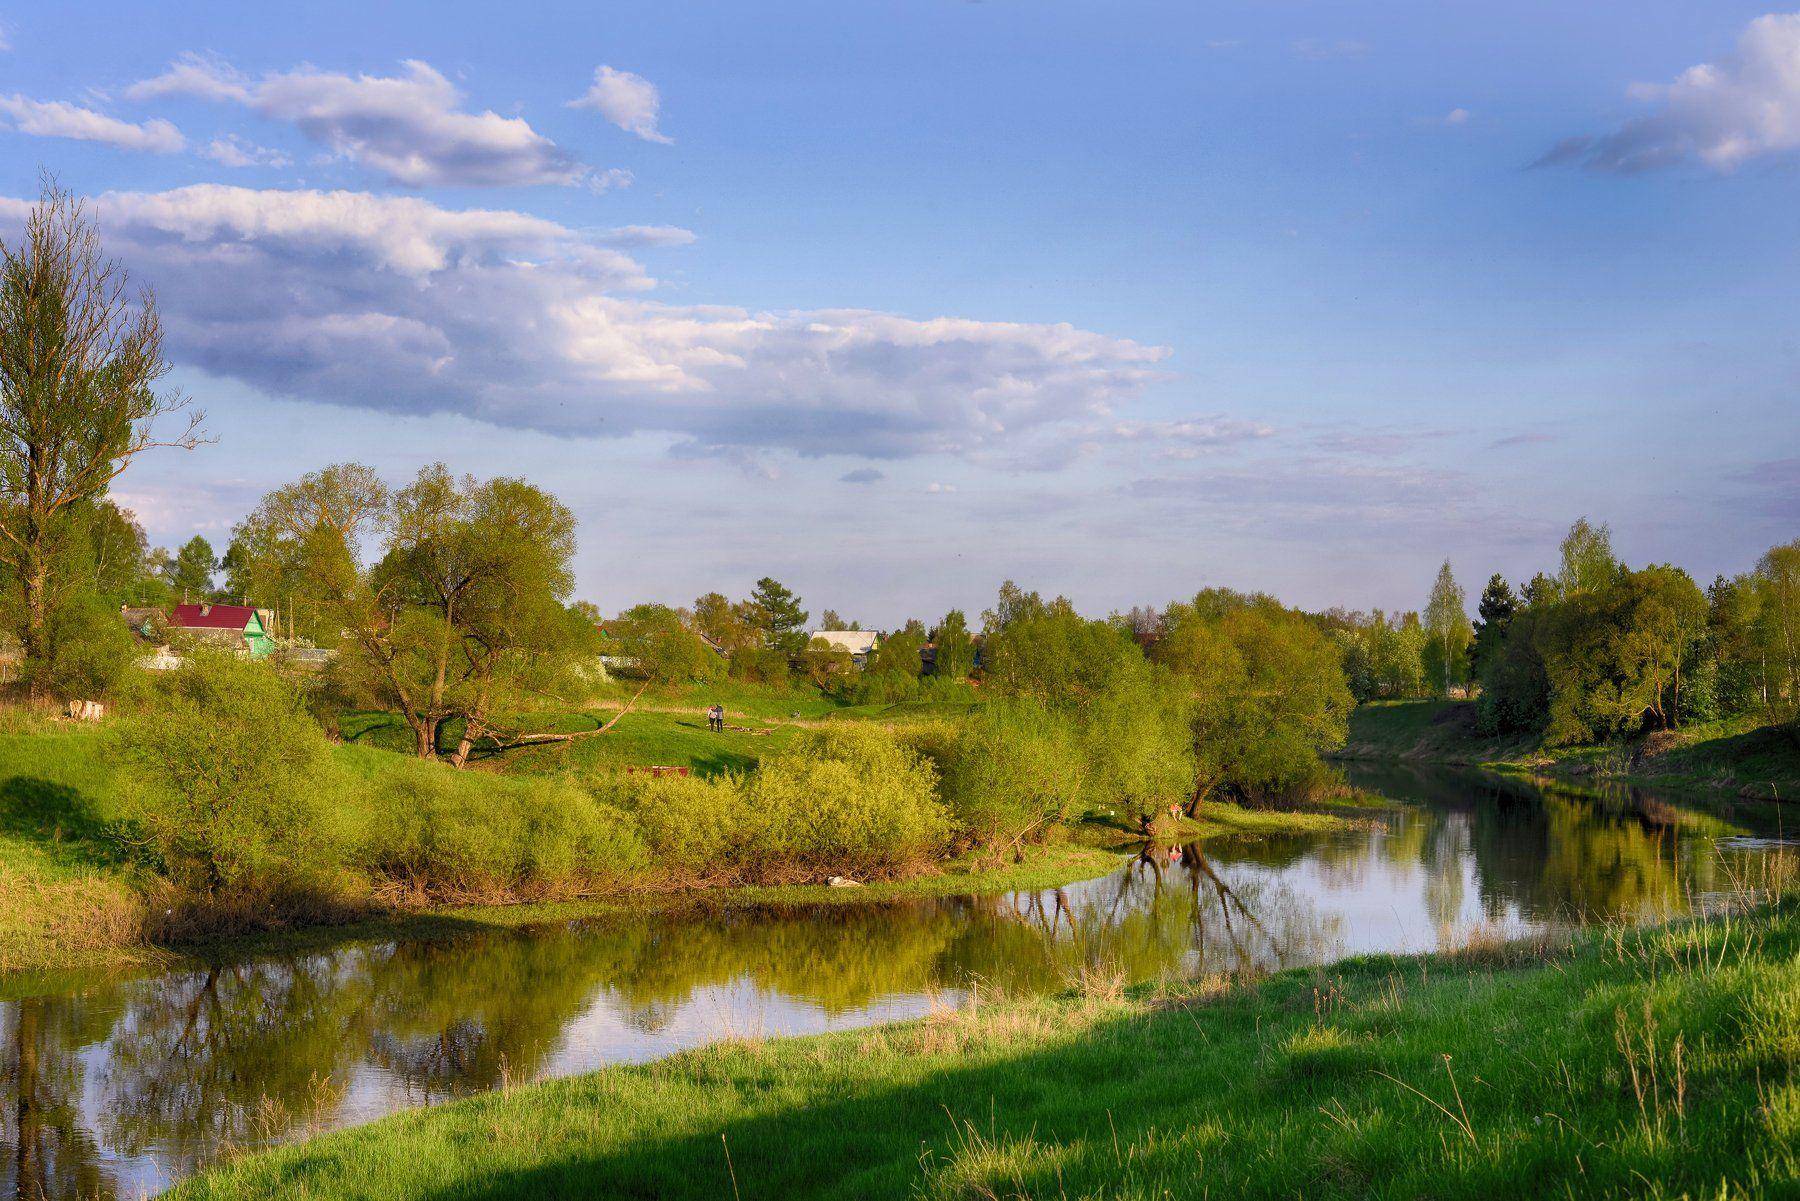 Весна, Небо, Пейзаж, Река, Лидия Киприч